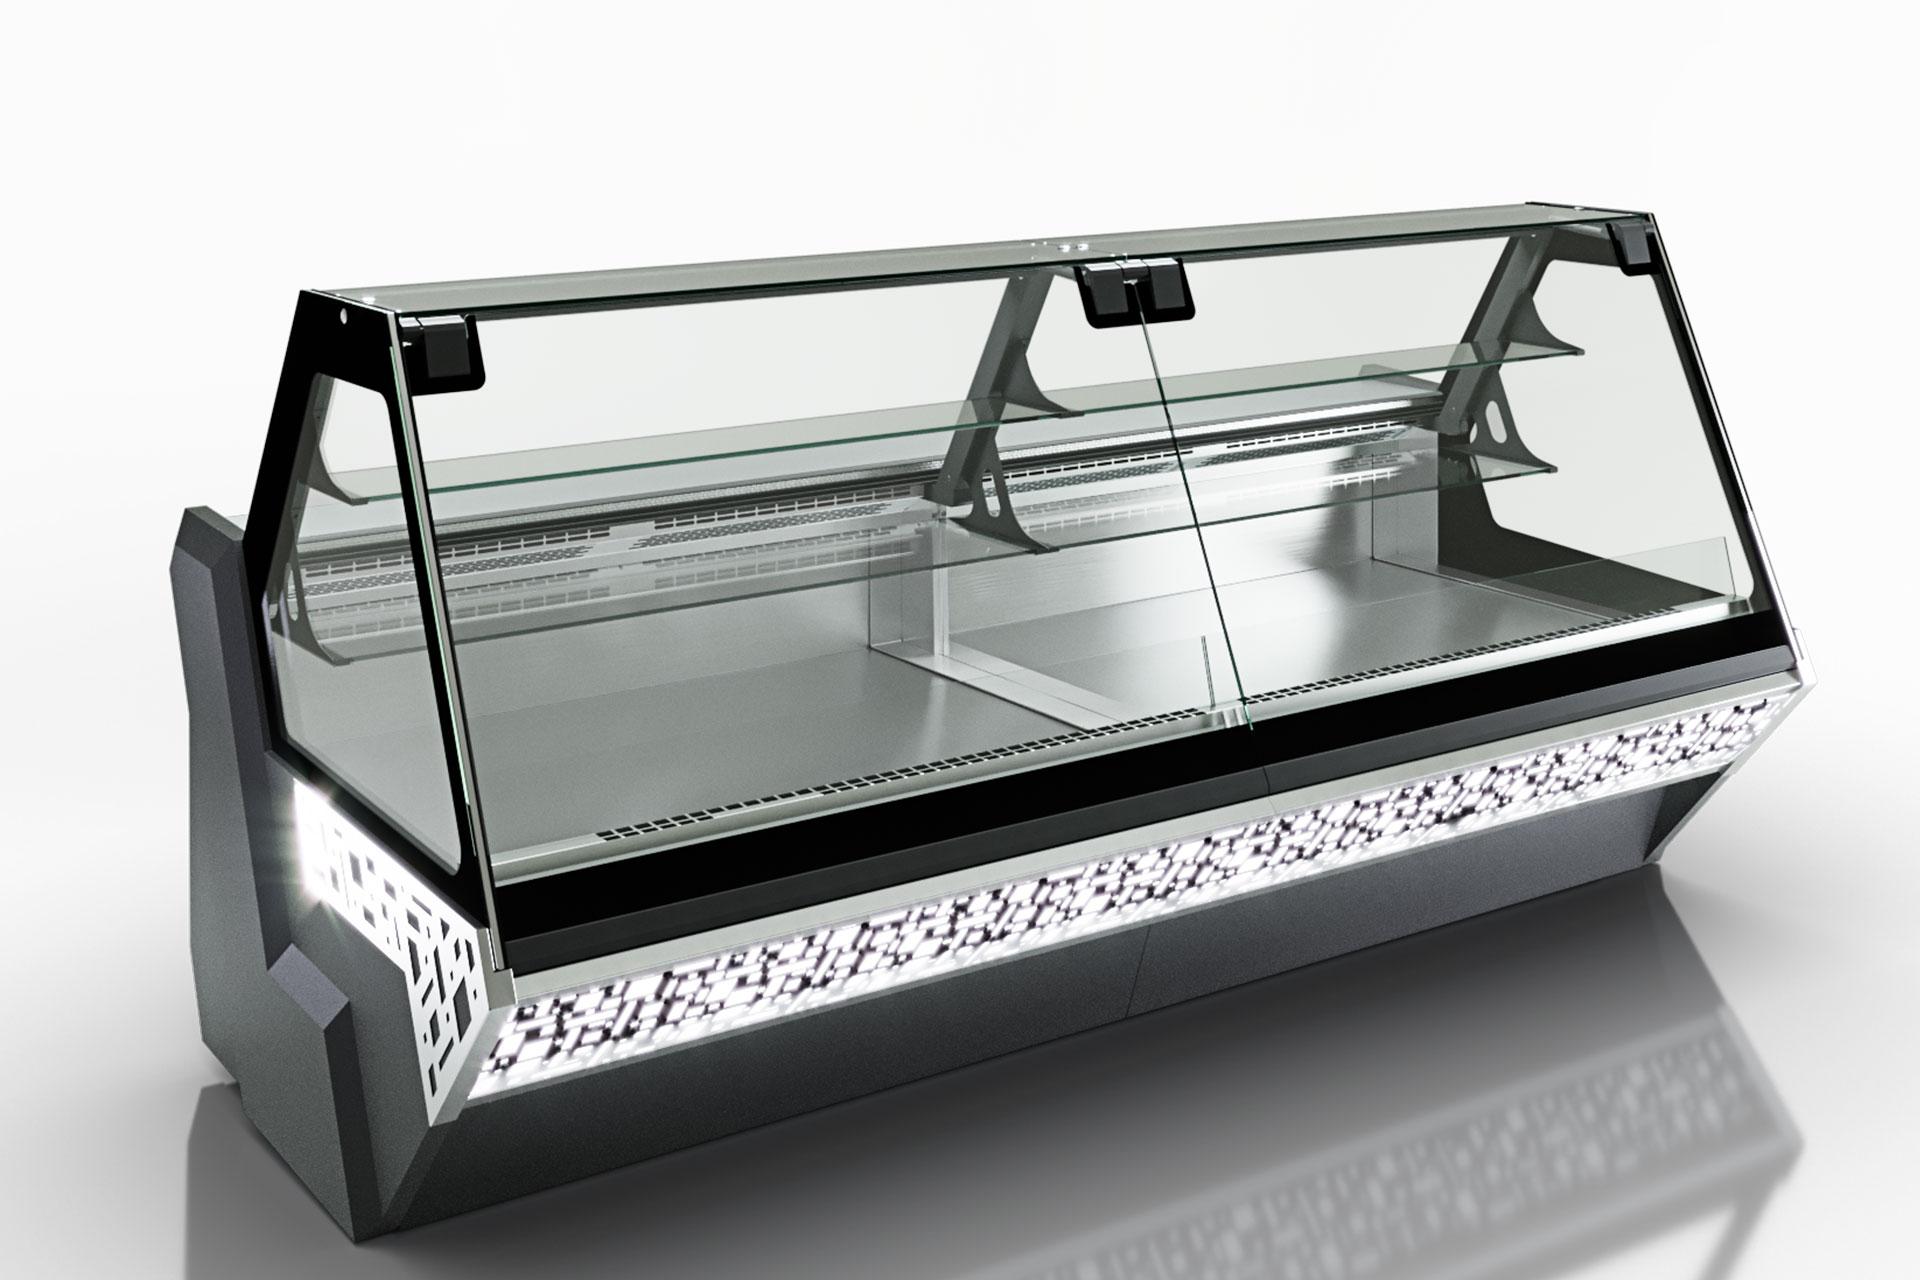 Кондитерская витрина Missouri sapphire MK 115 patisserie PS 125-DLM